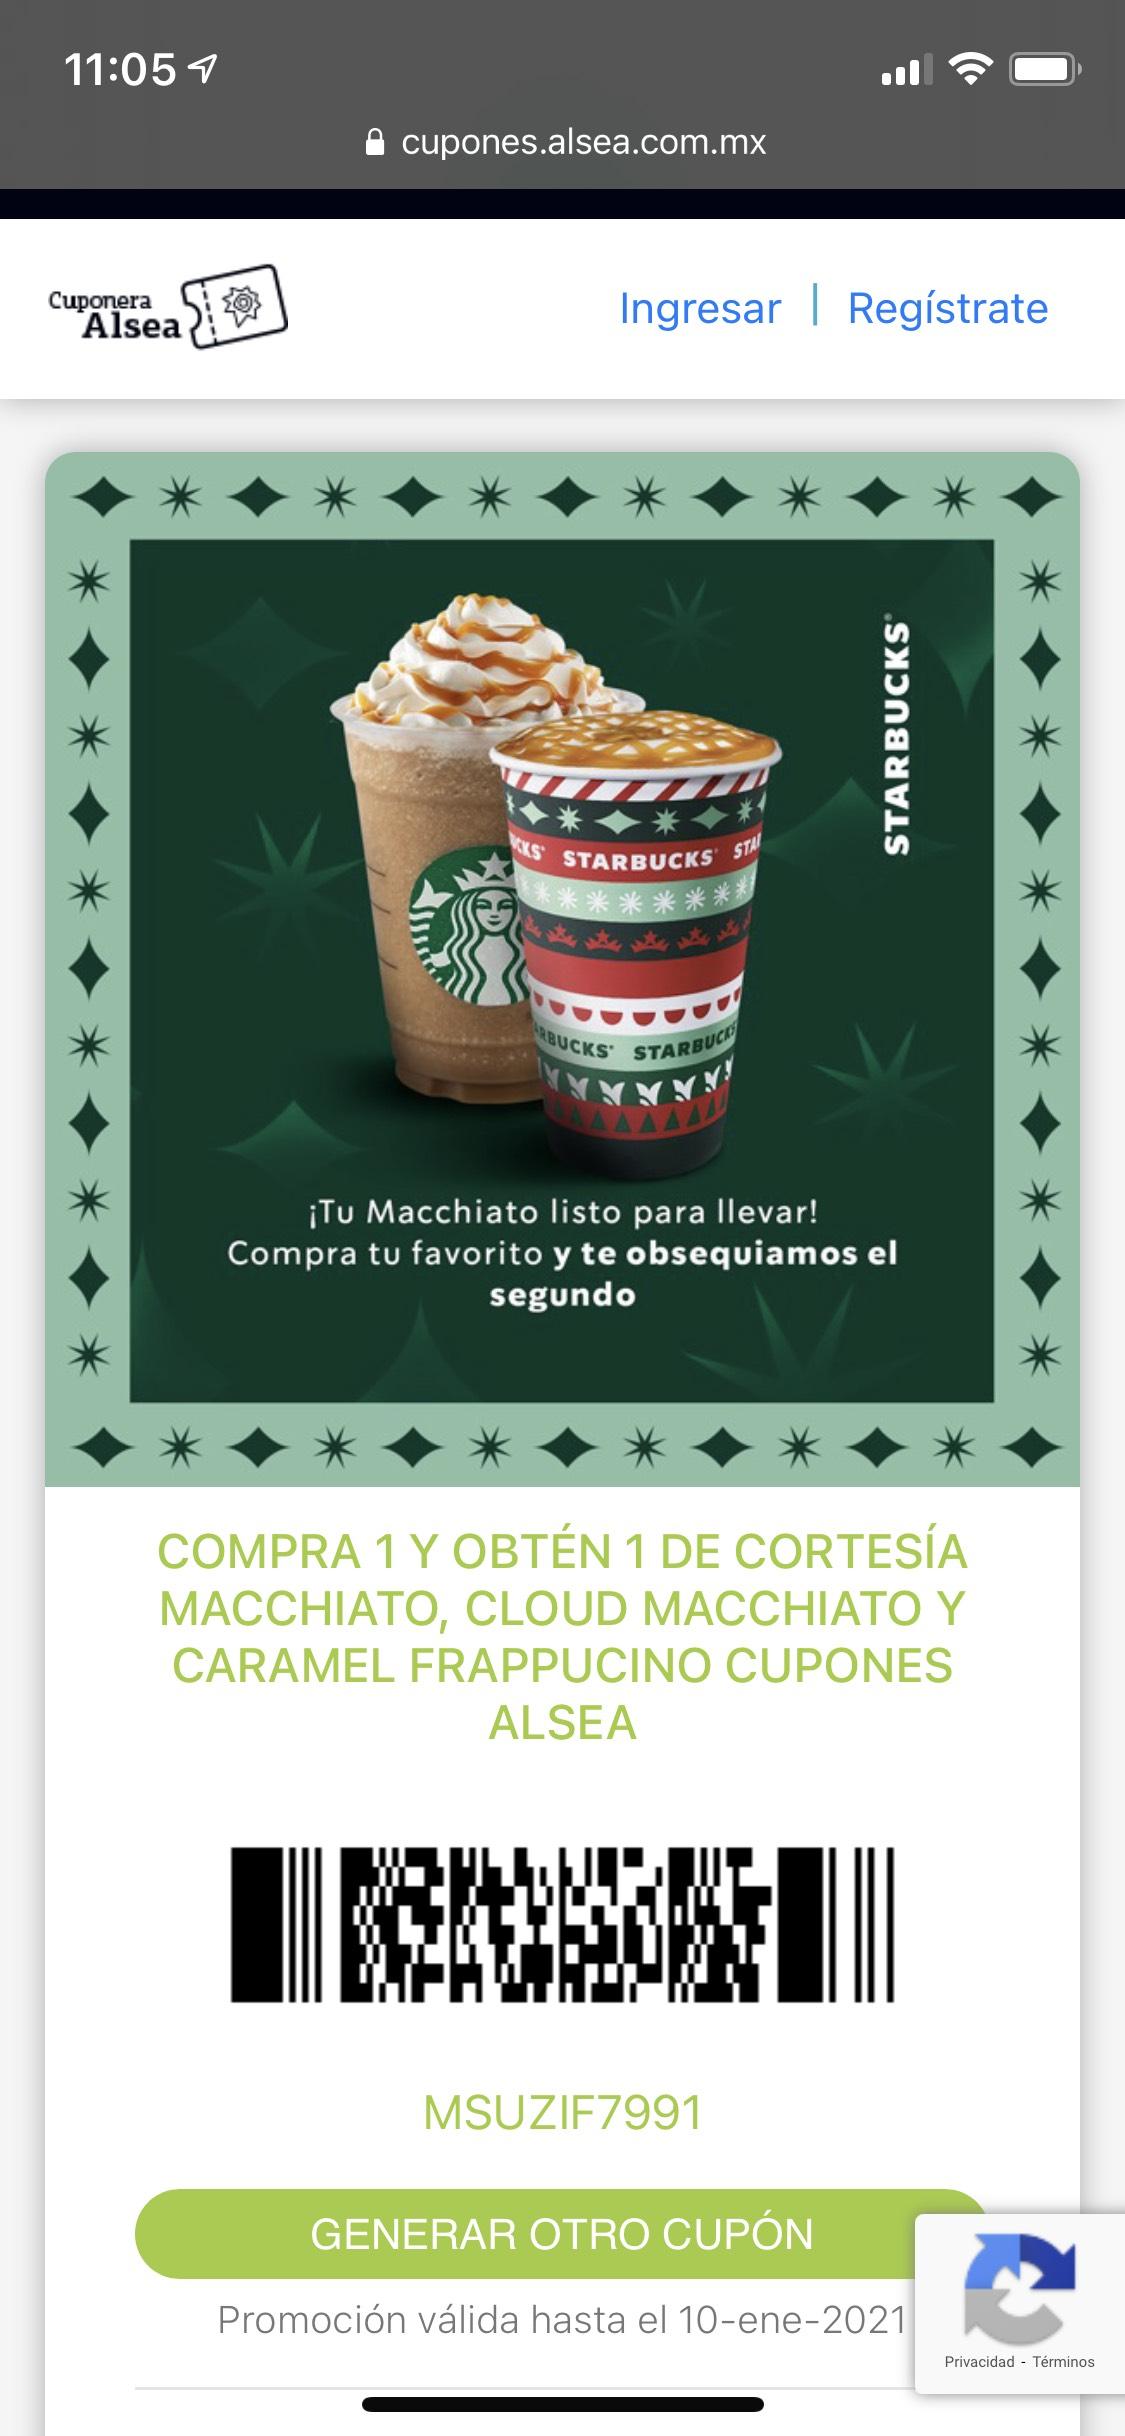 ALSEA: Starbucks - Macchiato's al 2x1